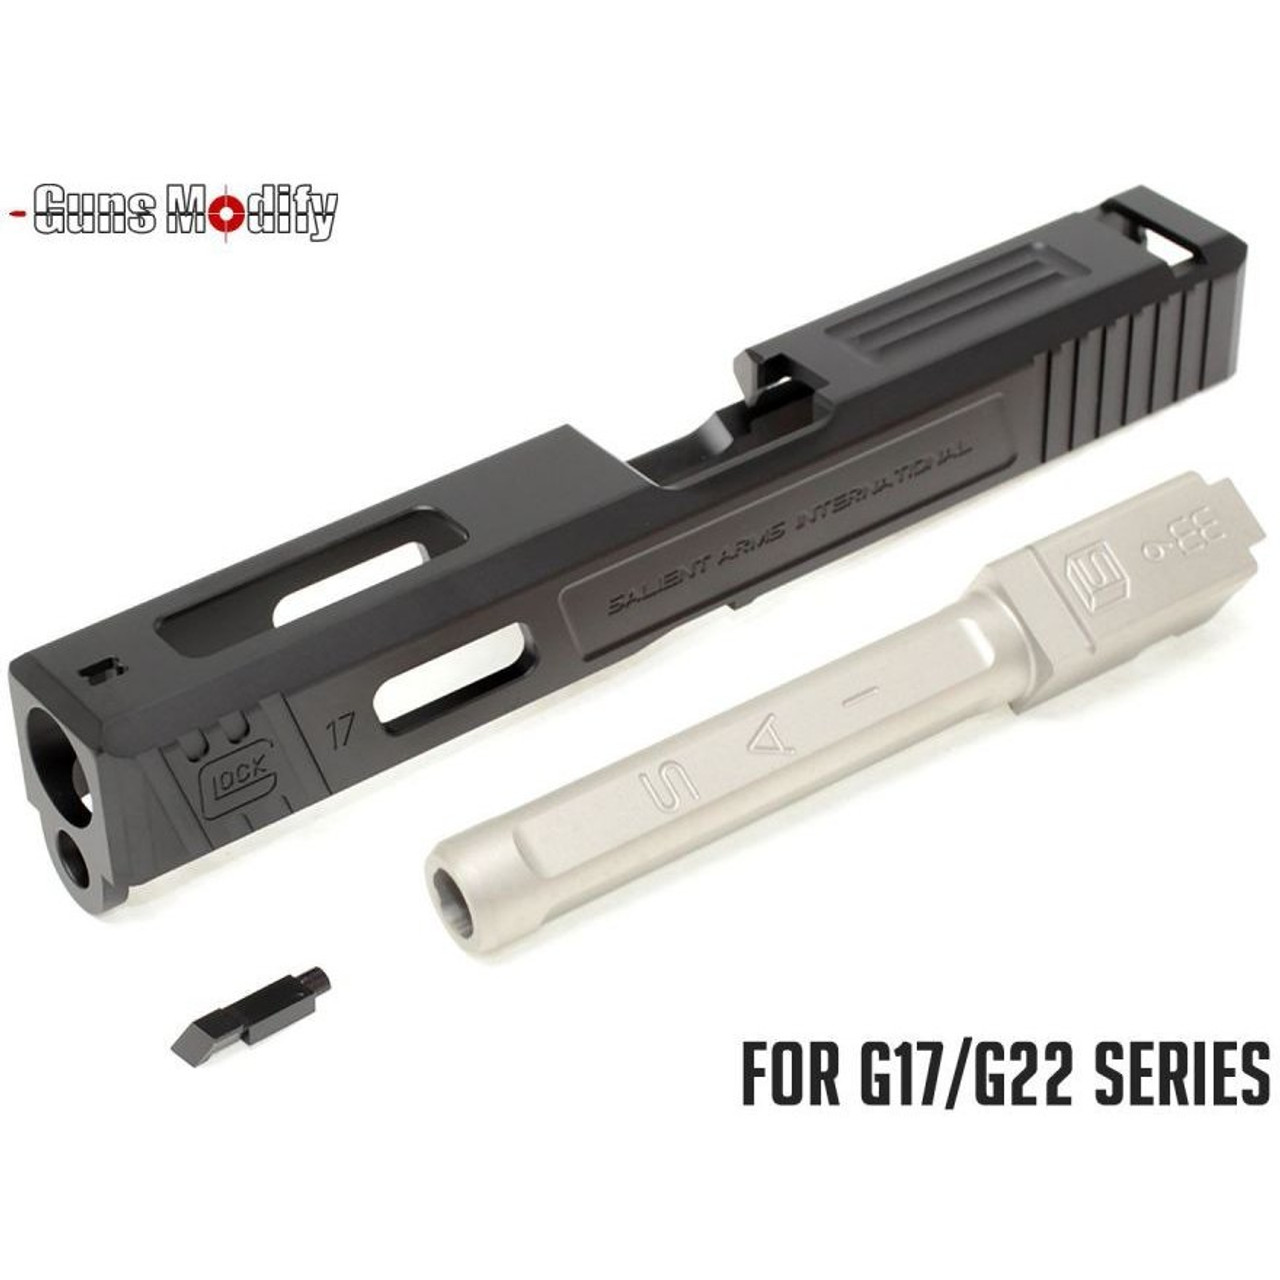 Guns Modify SA Alu CNC Slide/Stainless 4 fluted SV barrel Set for TM G17